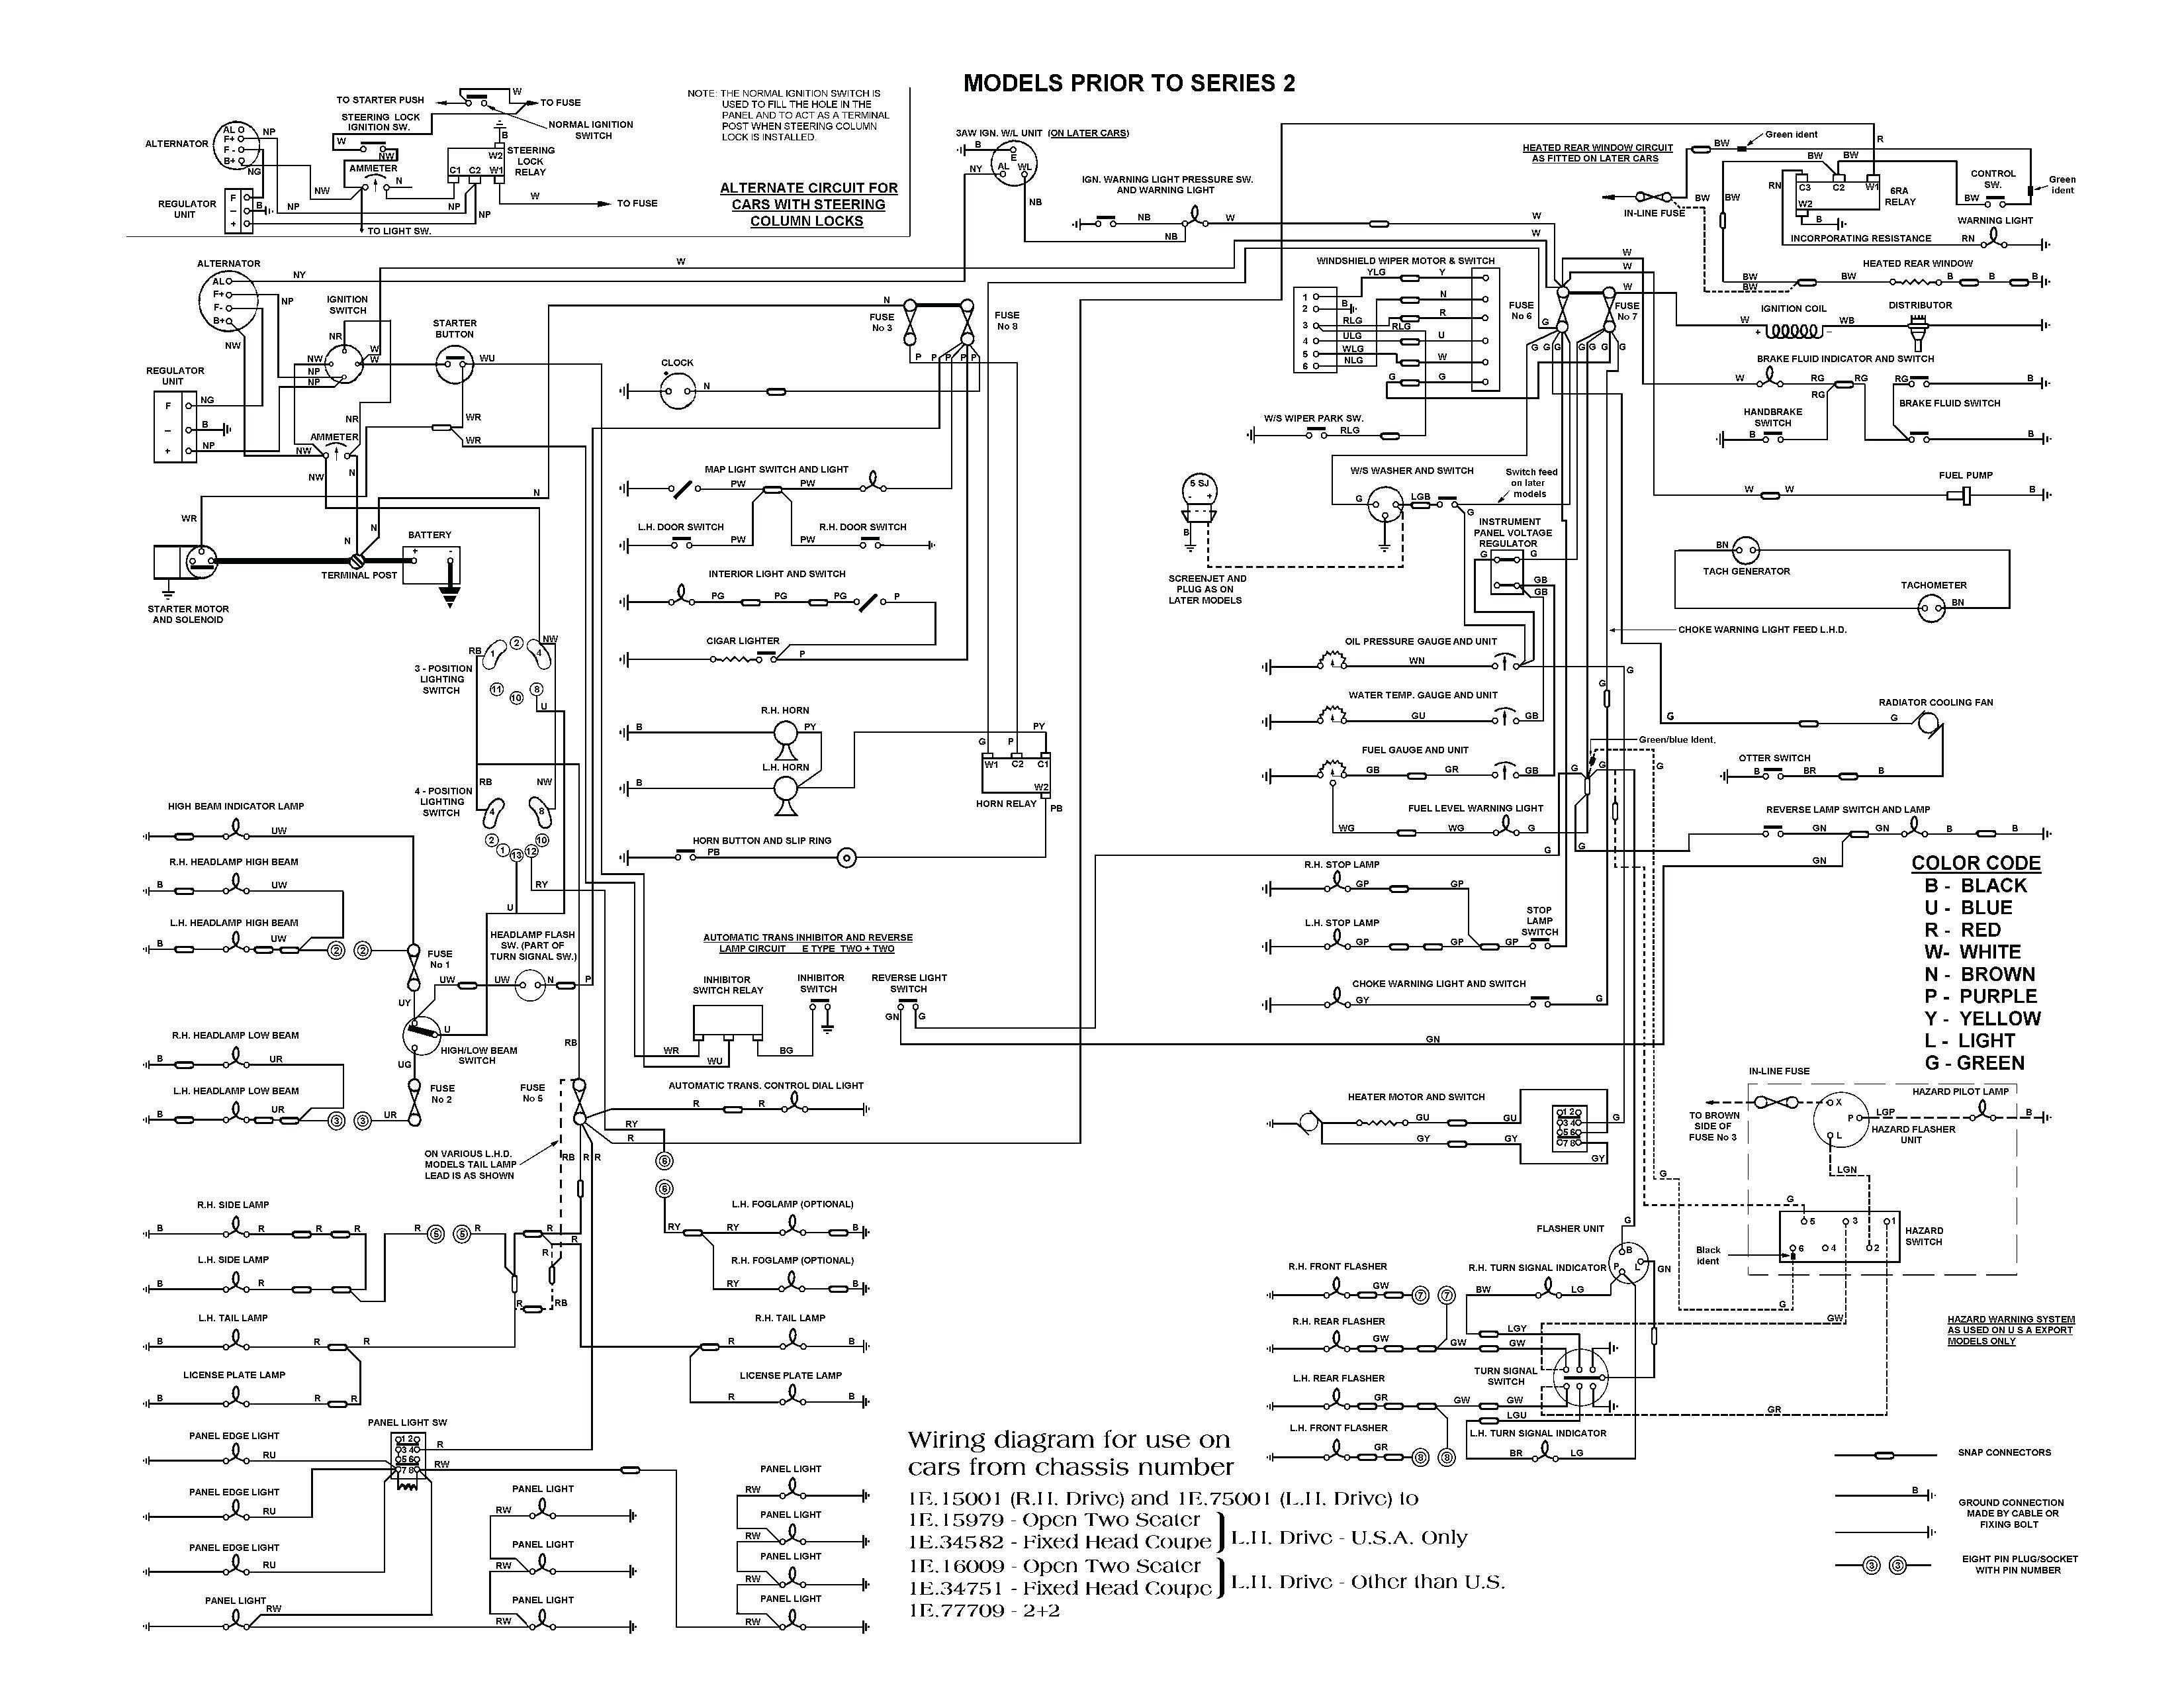 Engine Oiling Diagram E Type Fuel Temp Oil Ammeter Gauge Wiring Diagram Symbols Jaguar Xf Of Engine Oiling Diagram